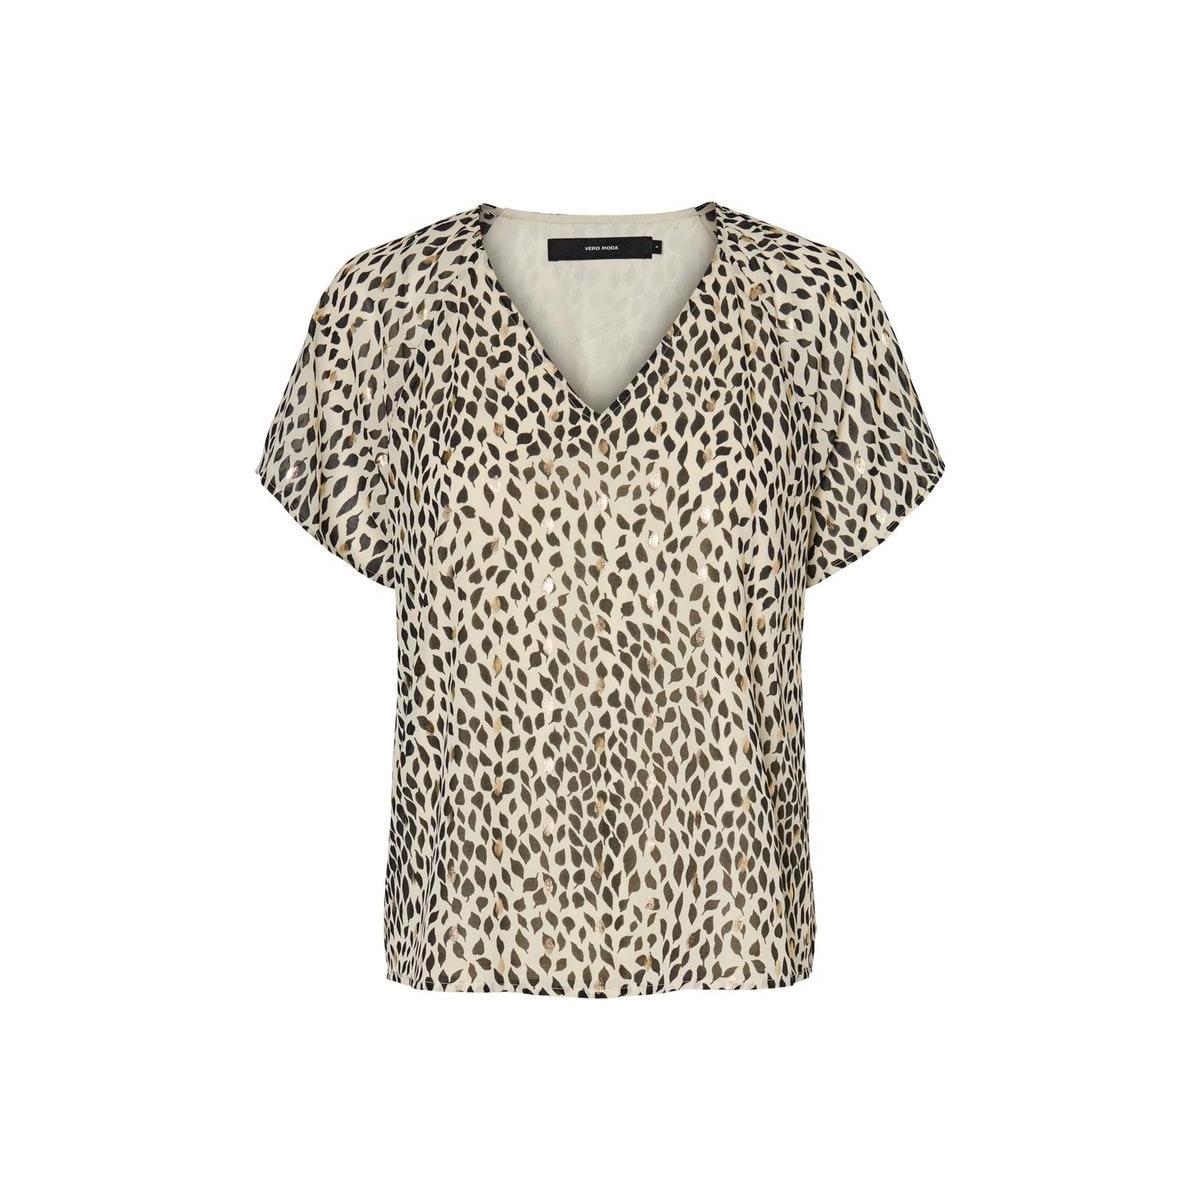 vmpenny s/s top wvn 10231205 vero moda t-shirt birch/penny